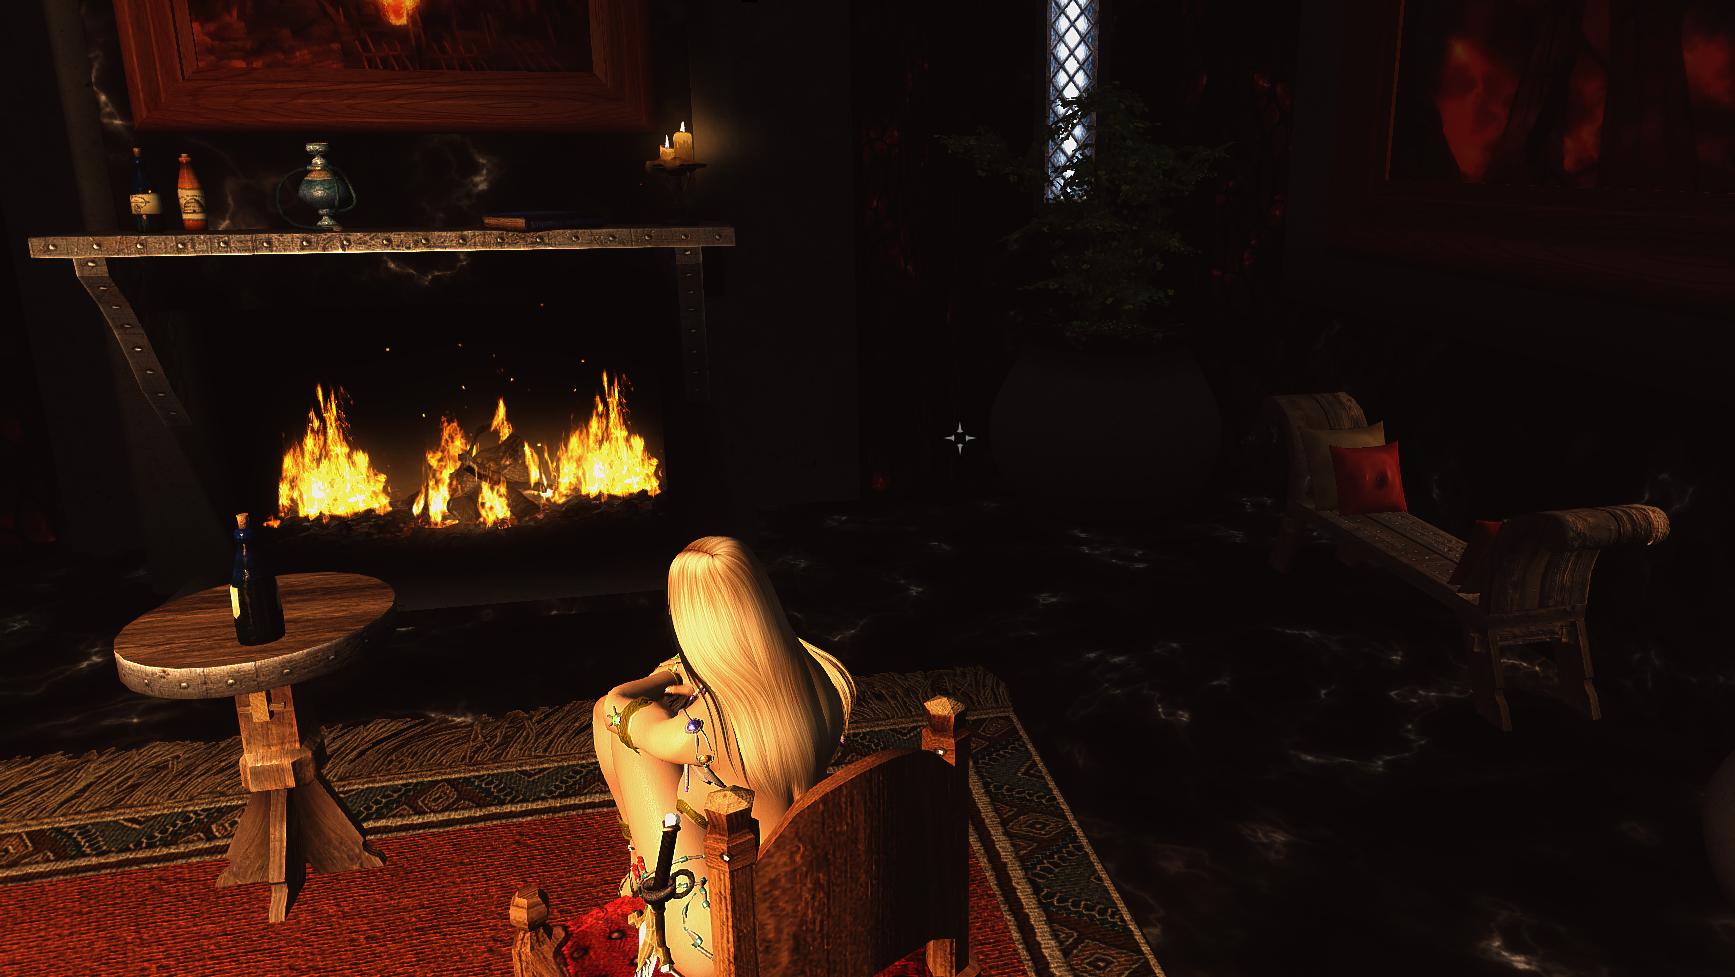 Tes V - Skyrim Screenshot 2018.06.13 - 18.32.31.25.png - Elder Scrolls 5: Skyrim, the